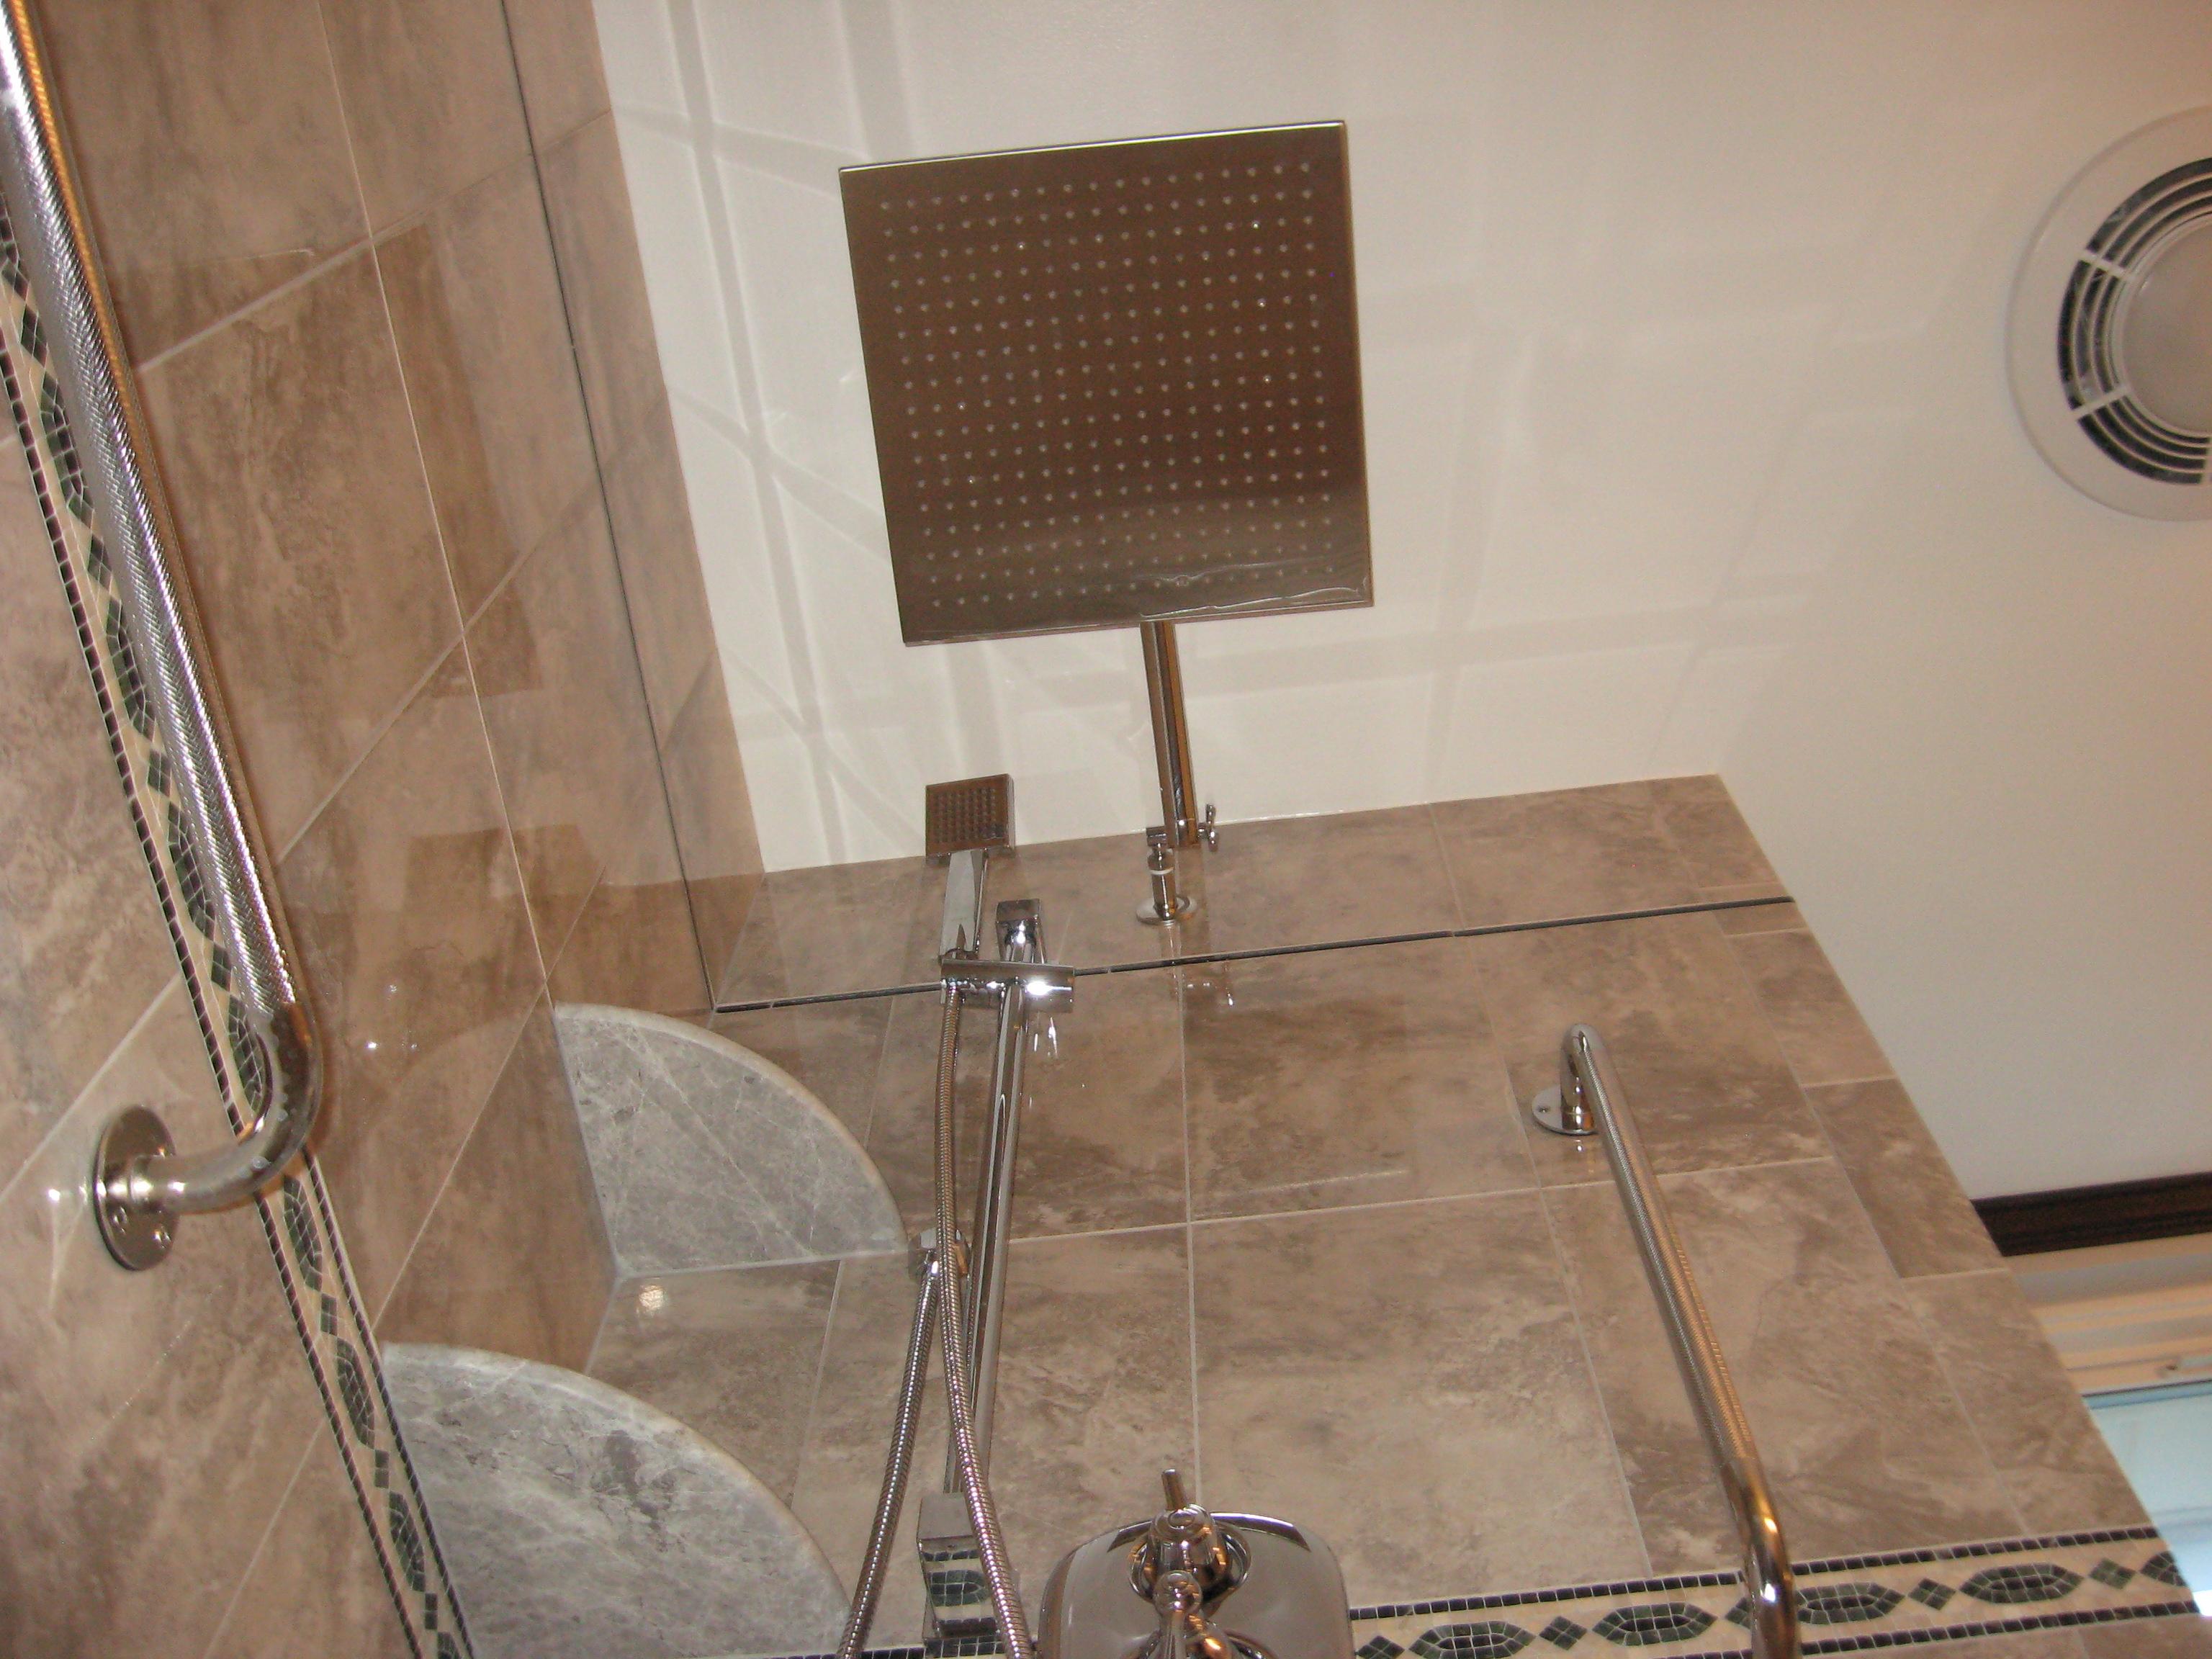 Replacement of toilet shut-off valve-img_1417.jpg